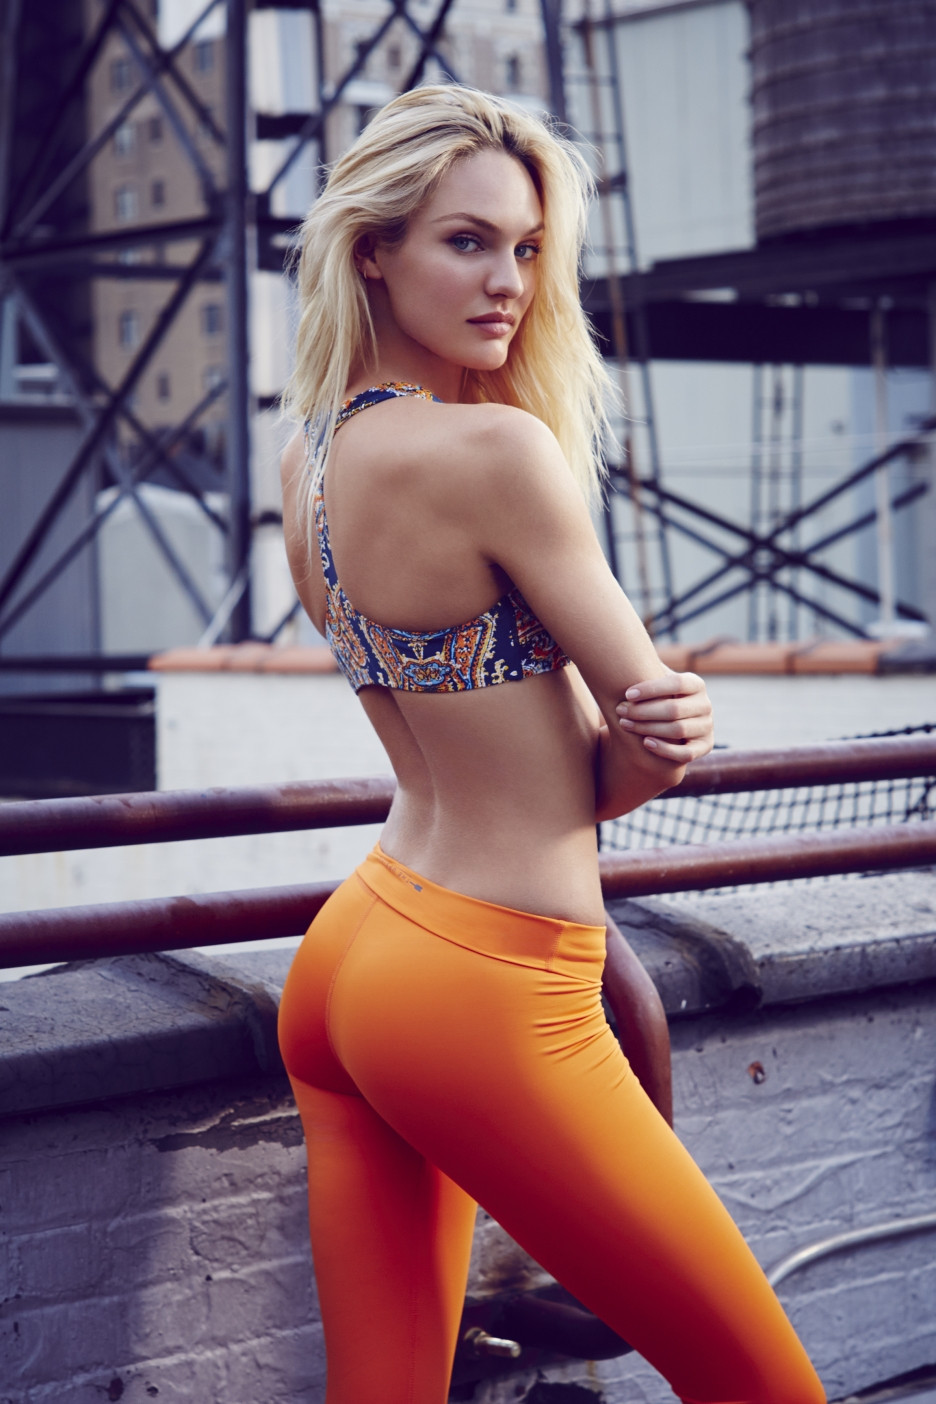 Hot Pants Girl